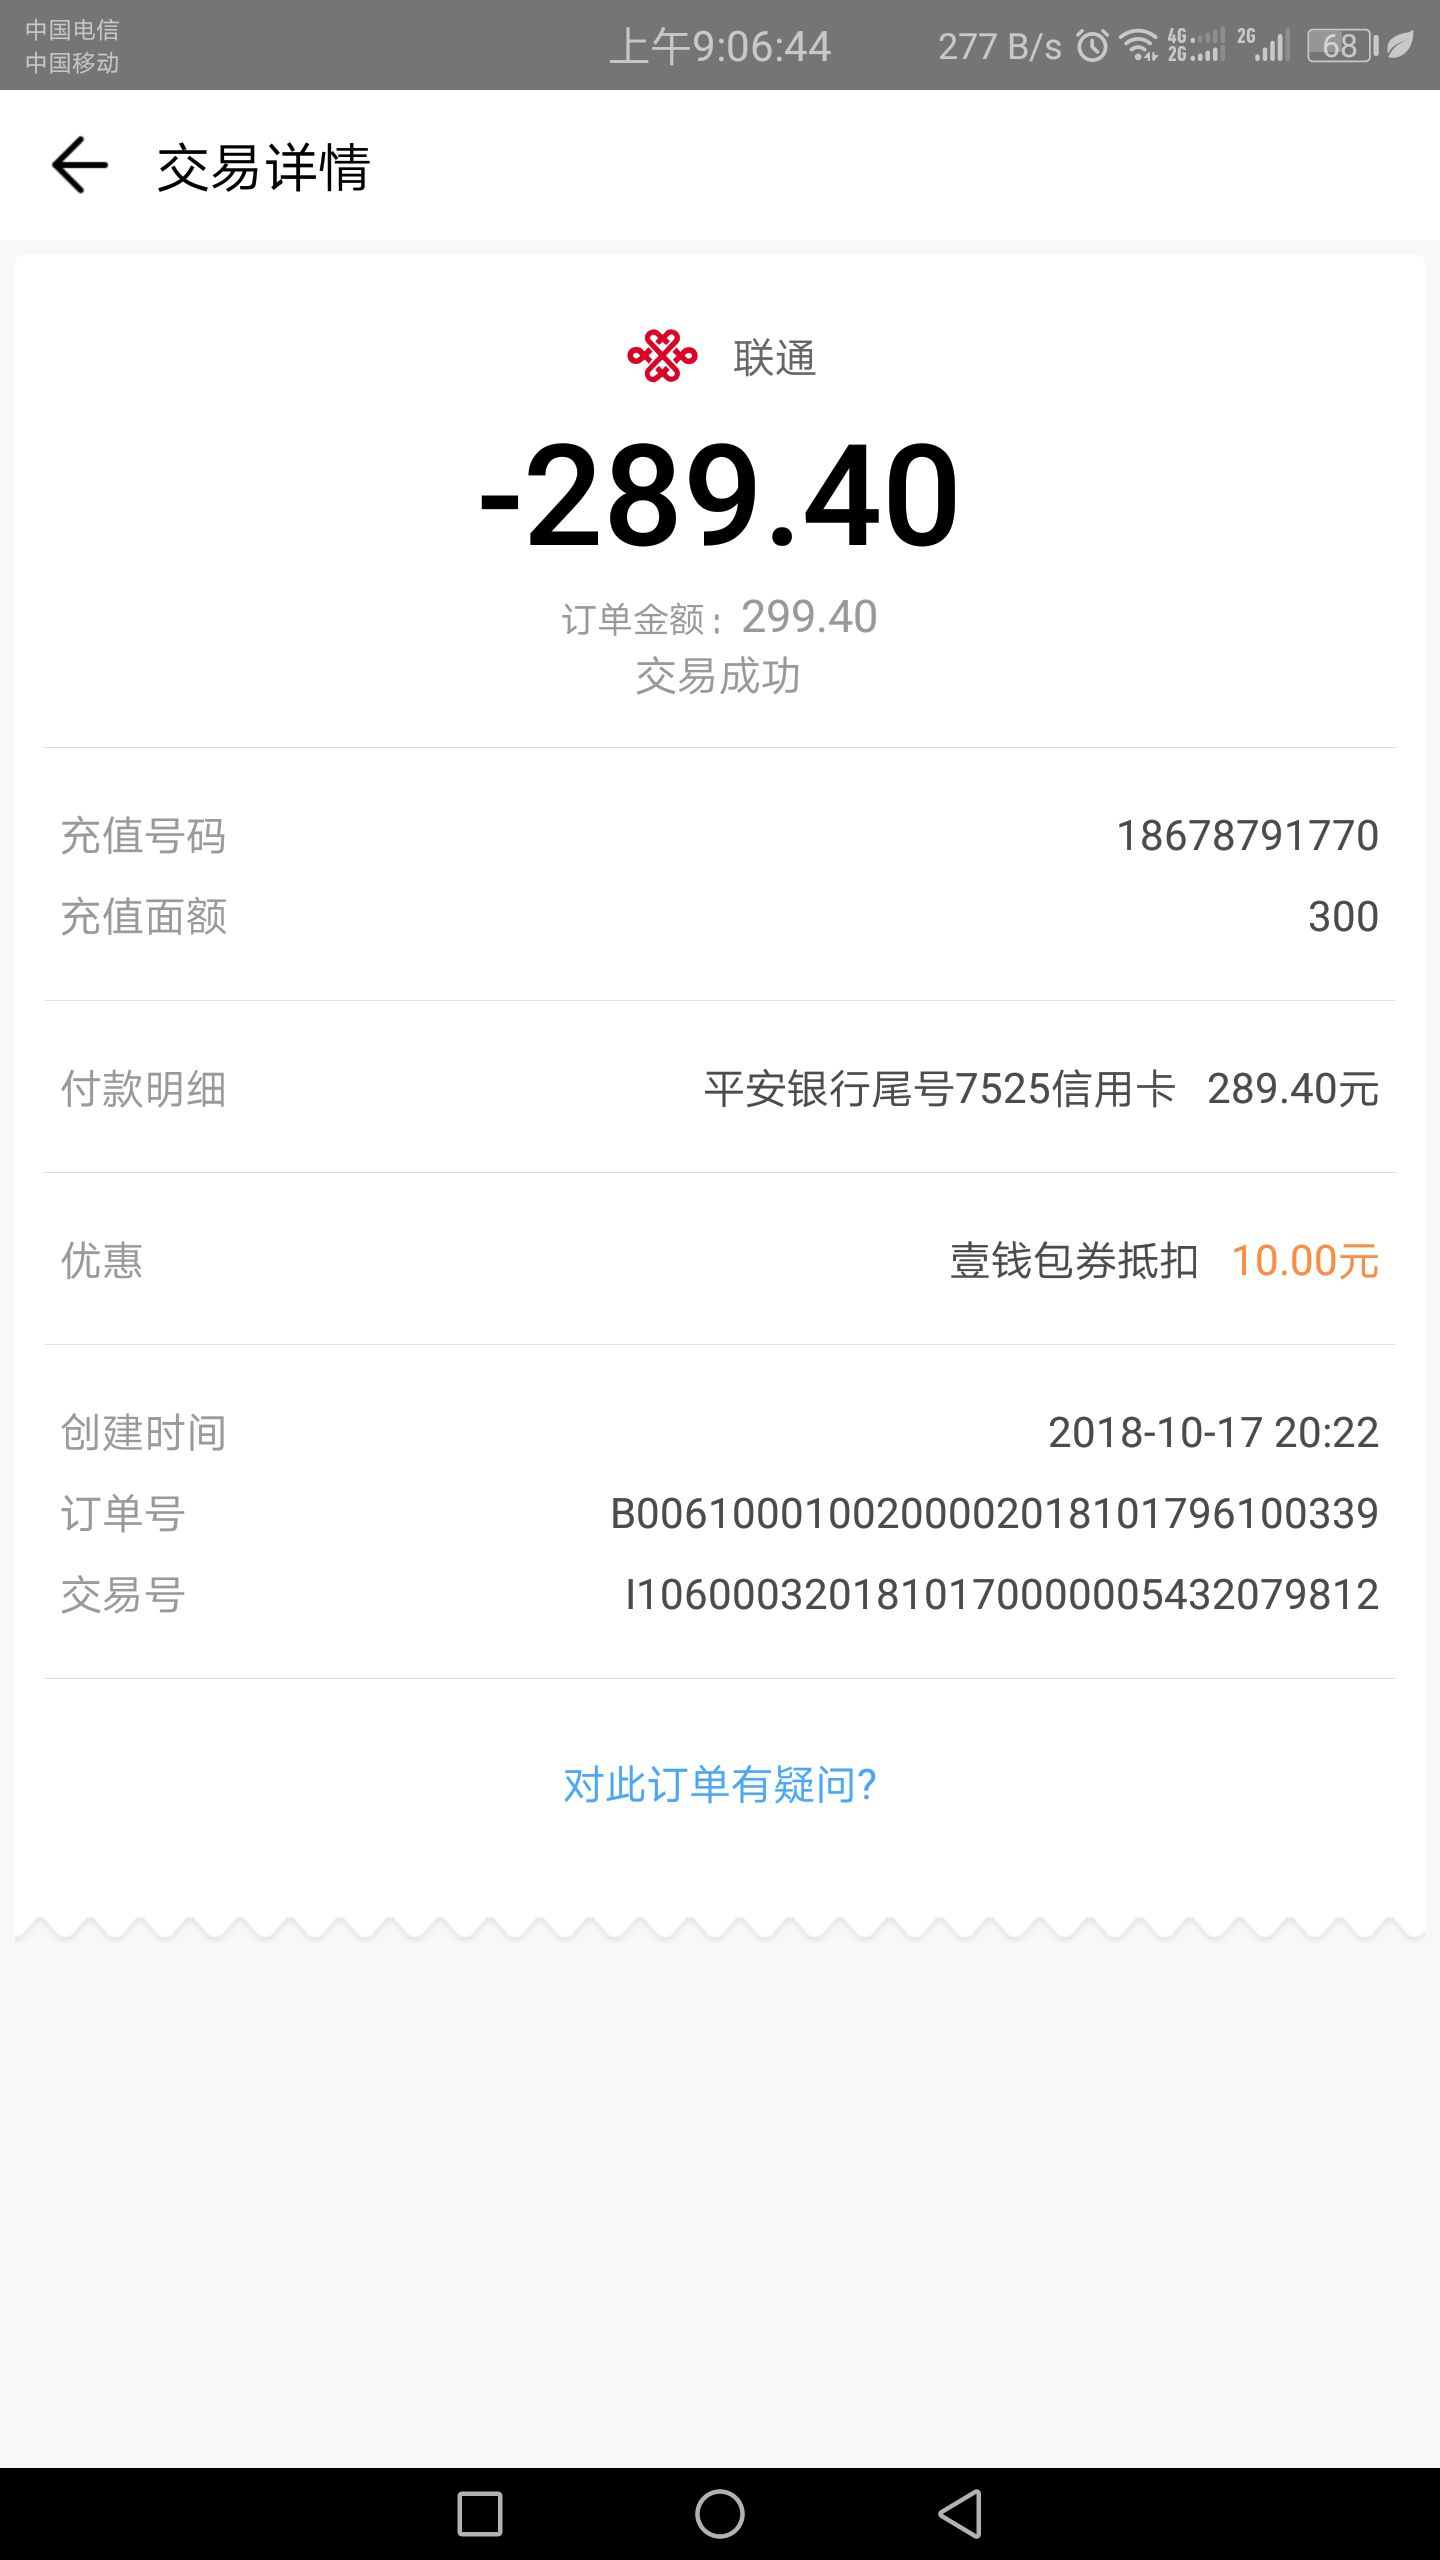 香港无码合集mdyguocom